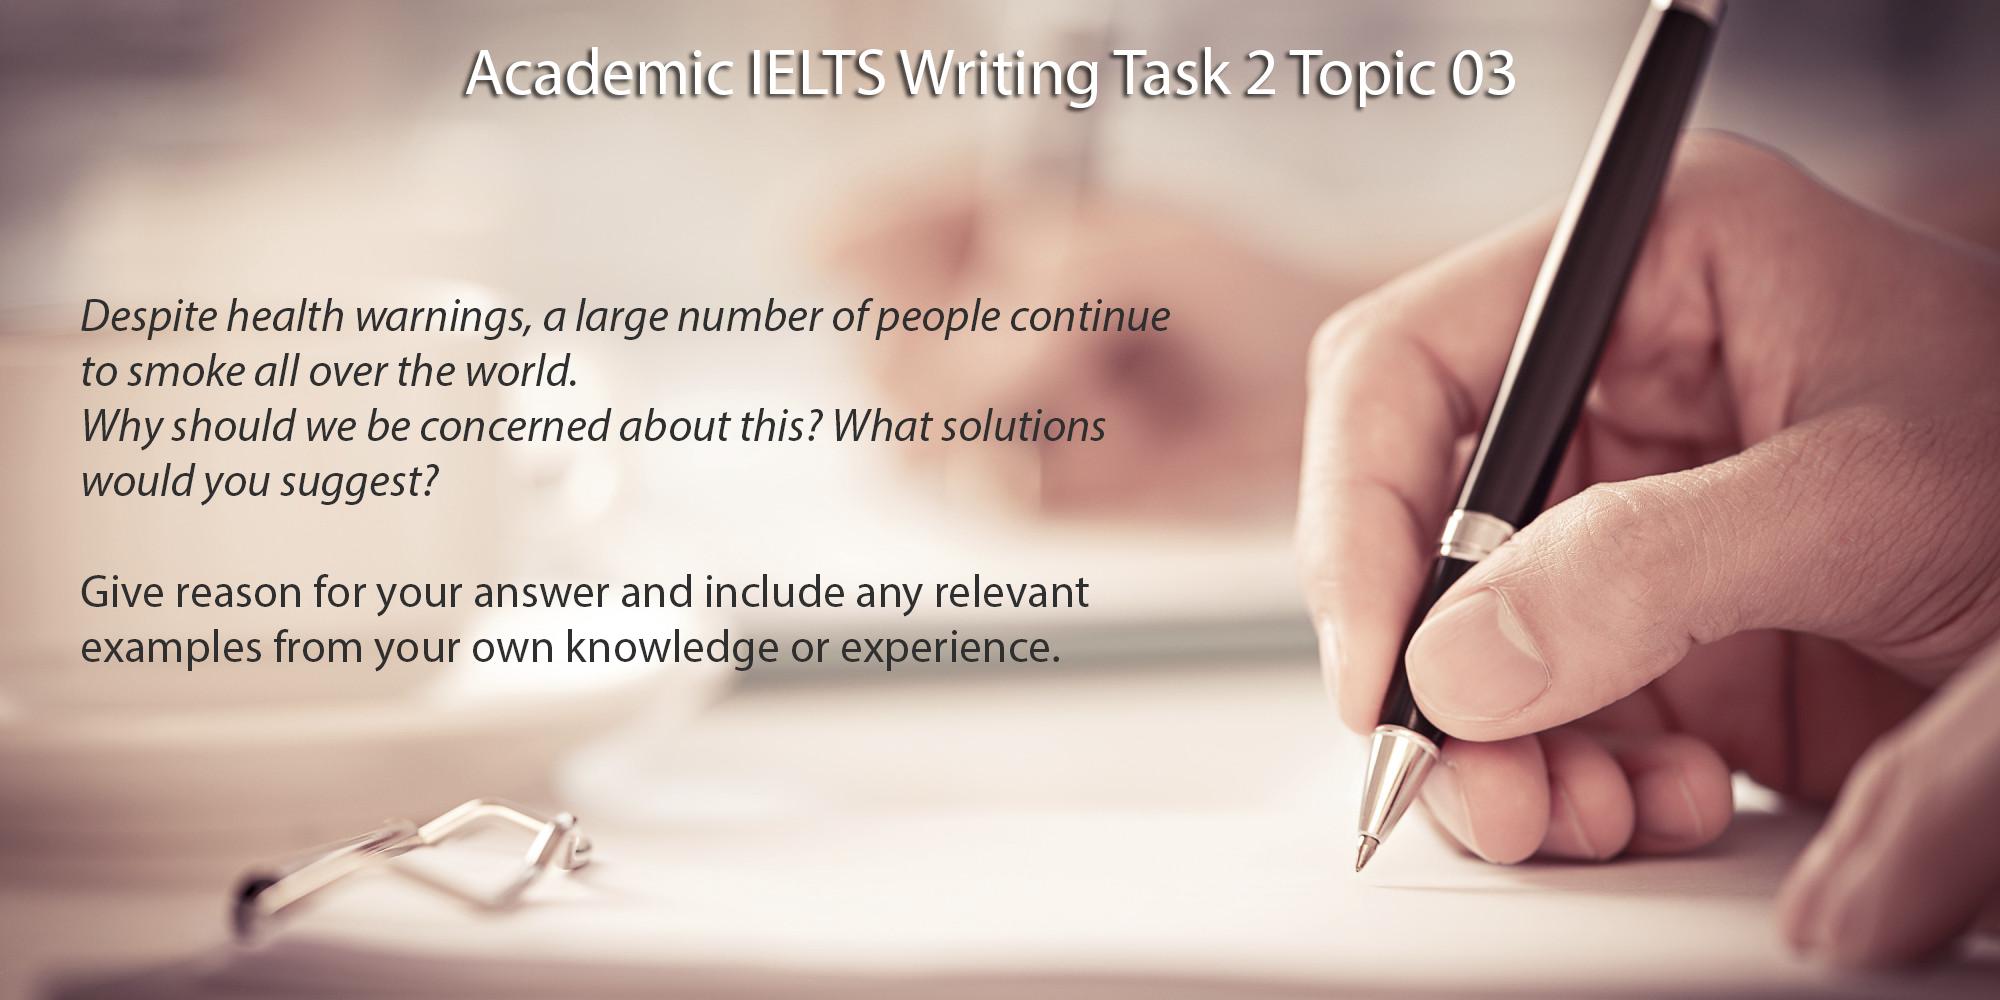 Academic IELTS Writing Task 2 Topic 03